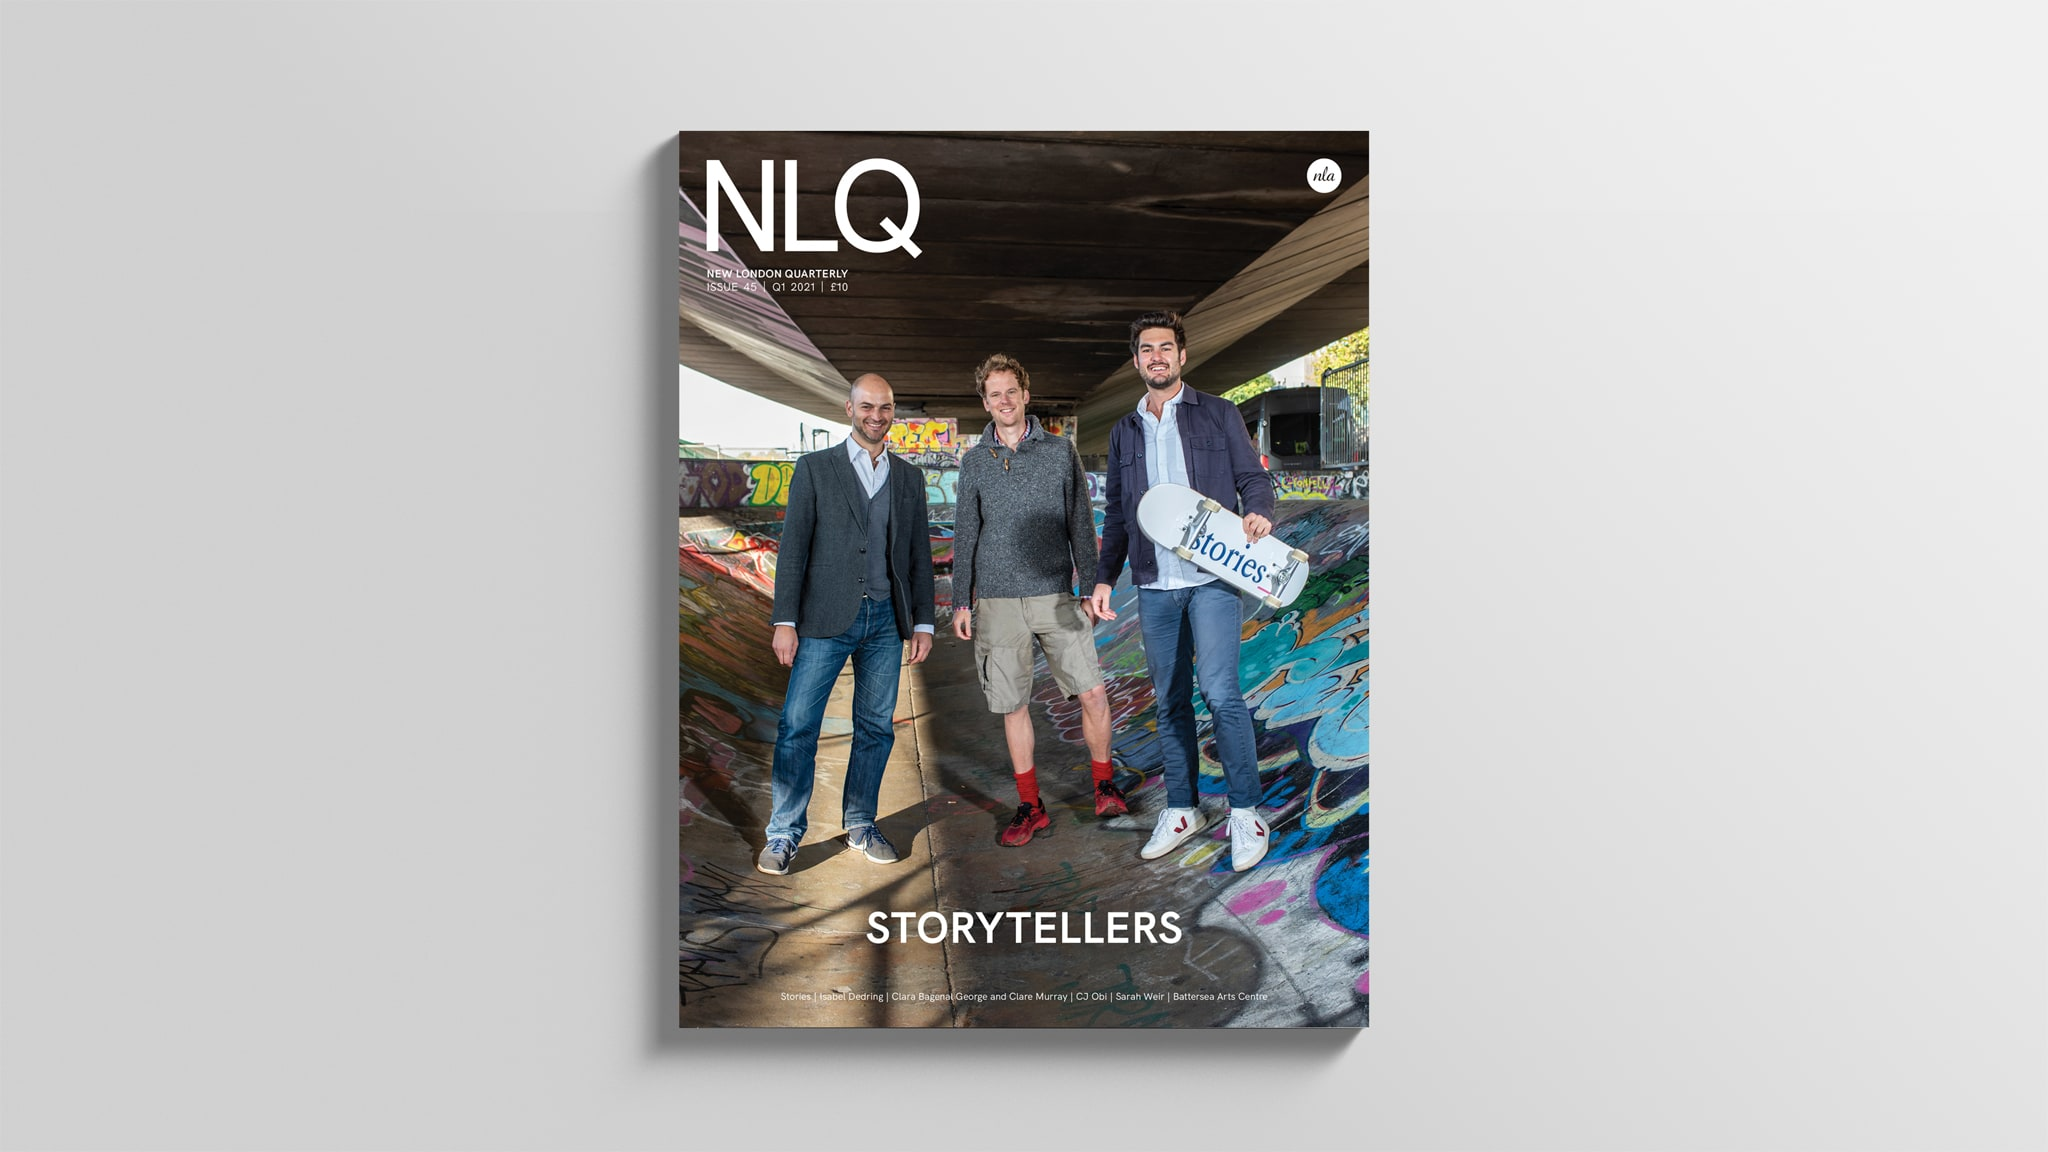 NLQ Issue 45